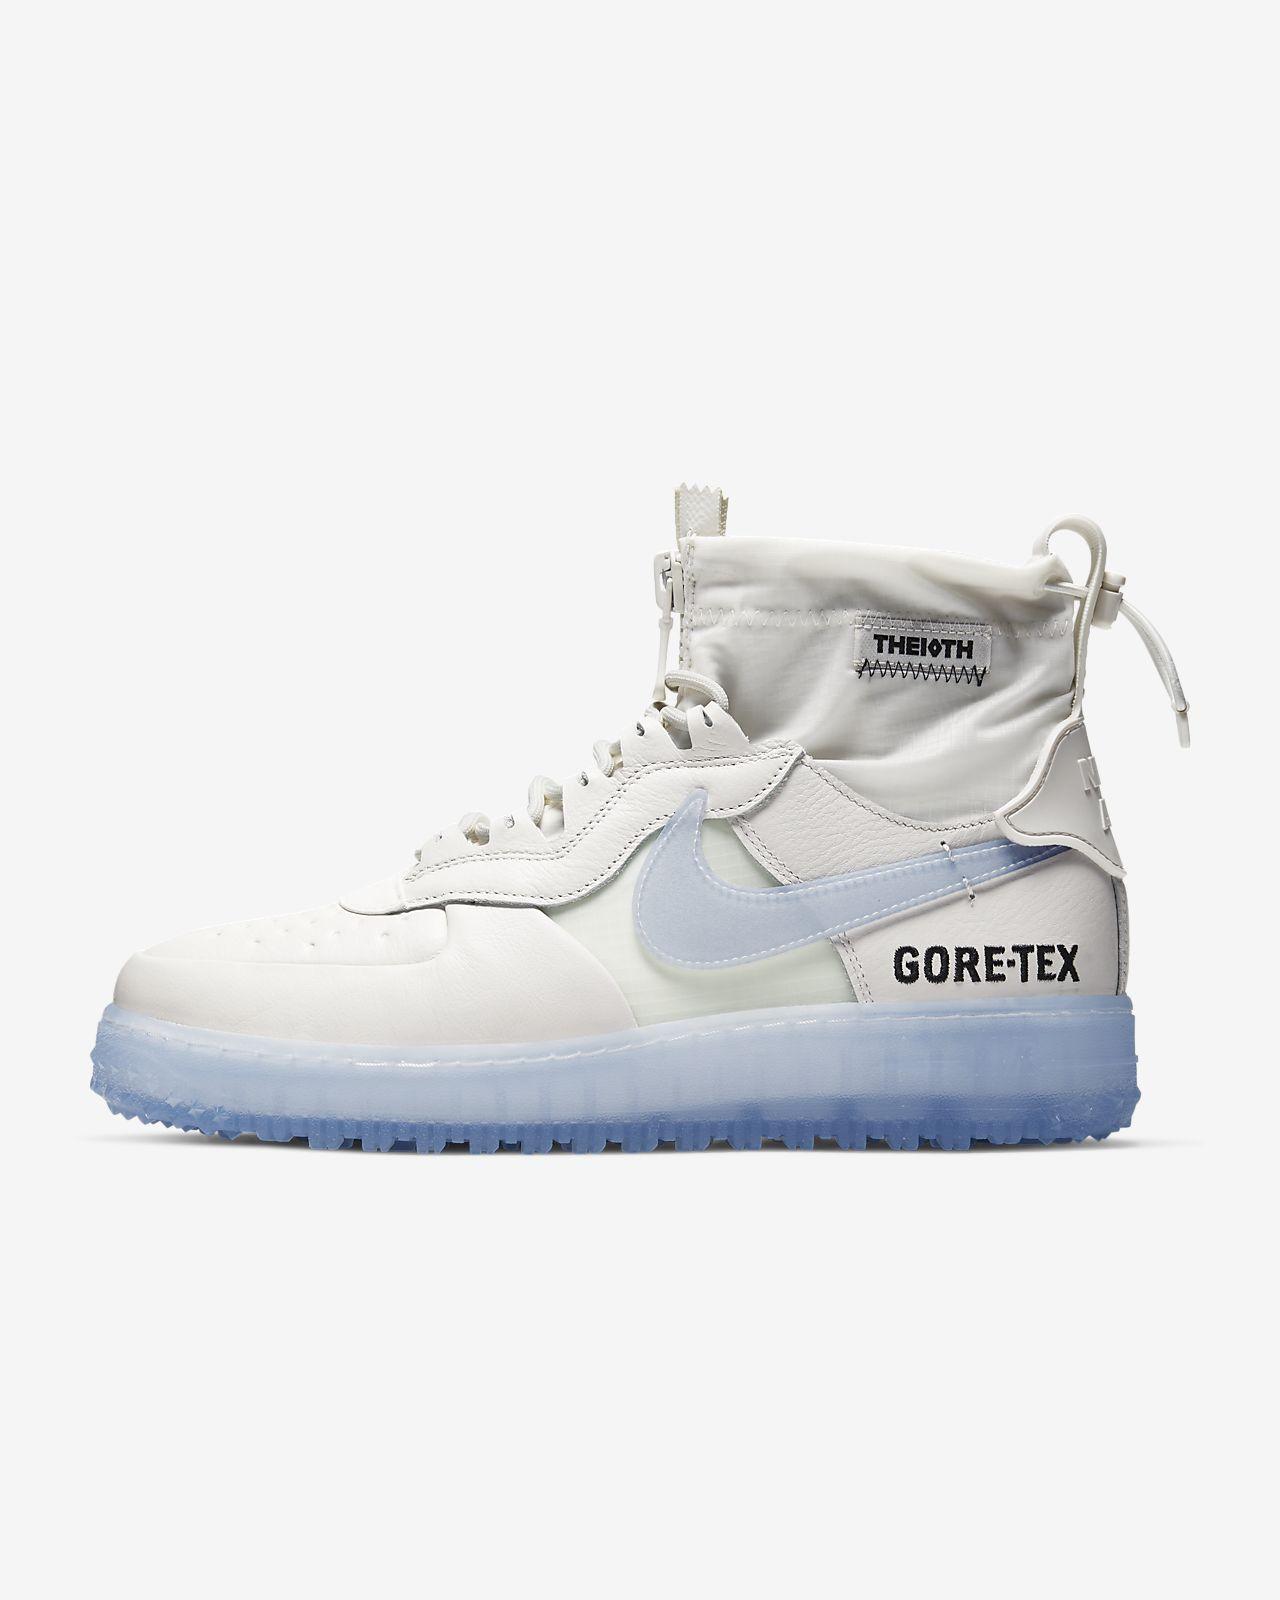 Nike Air Force 1 Winter GORE-TEX Boot